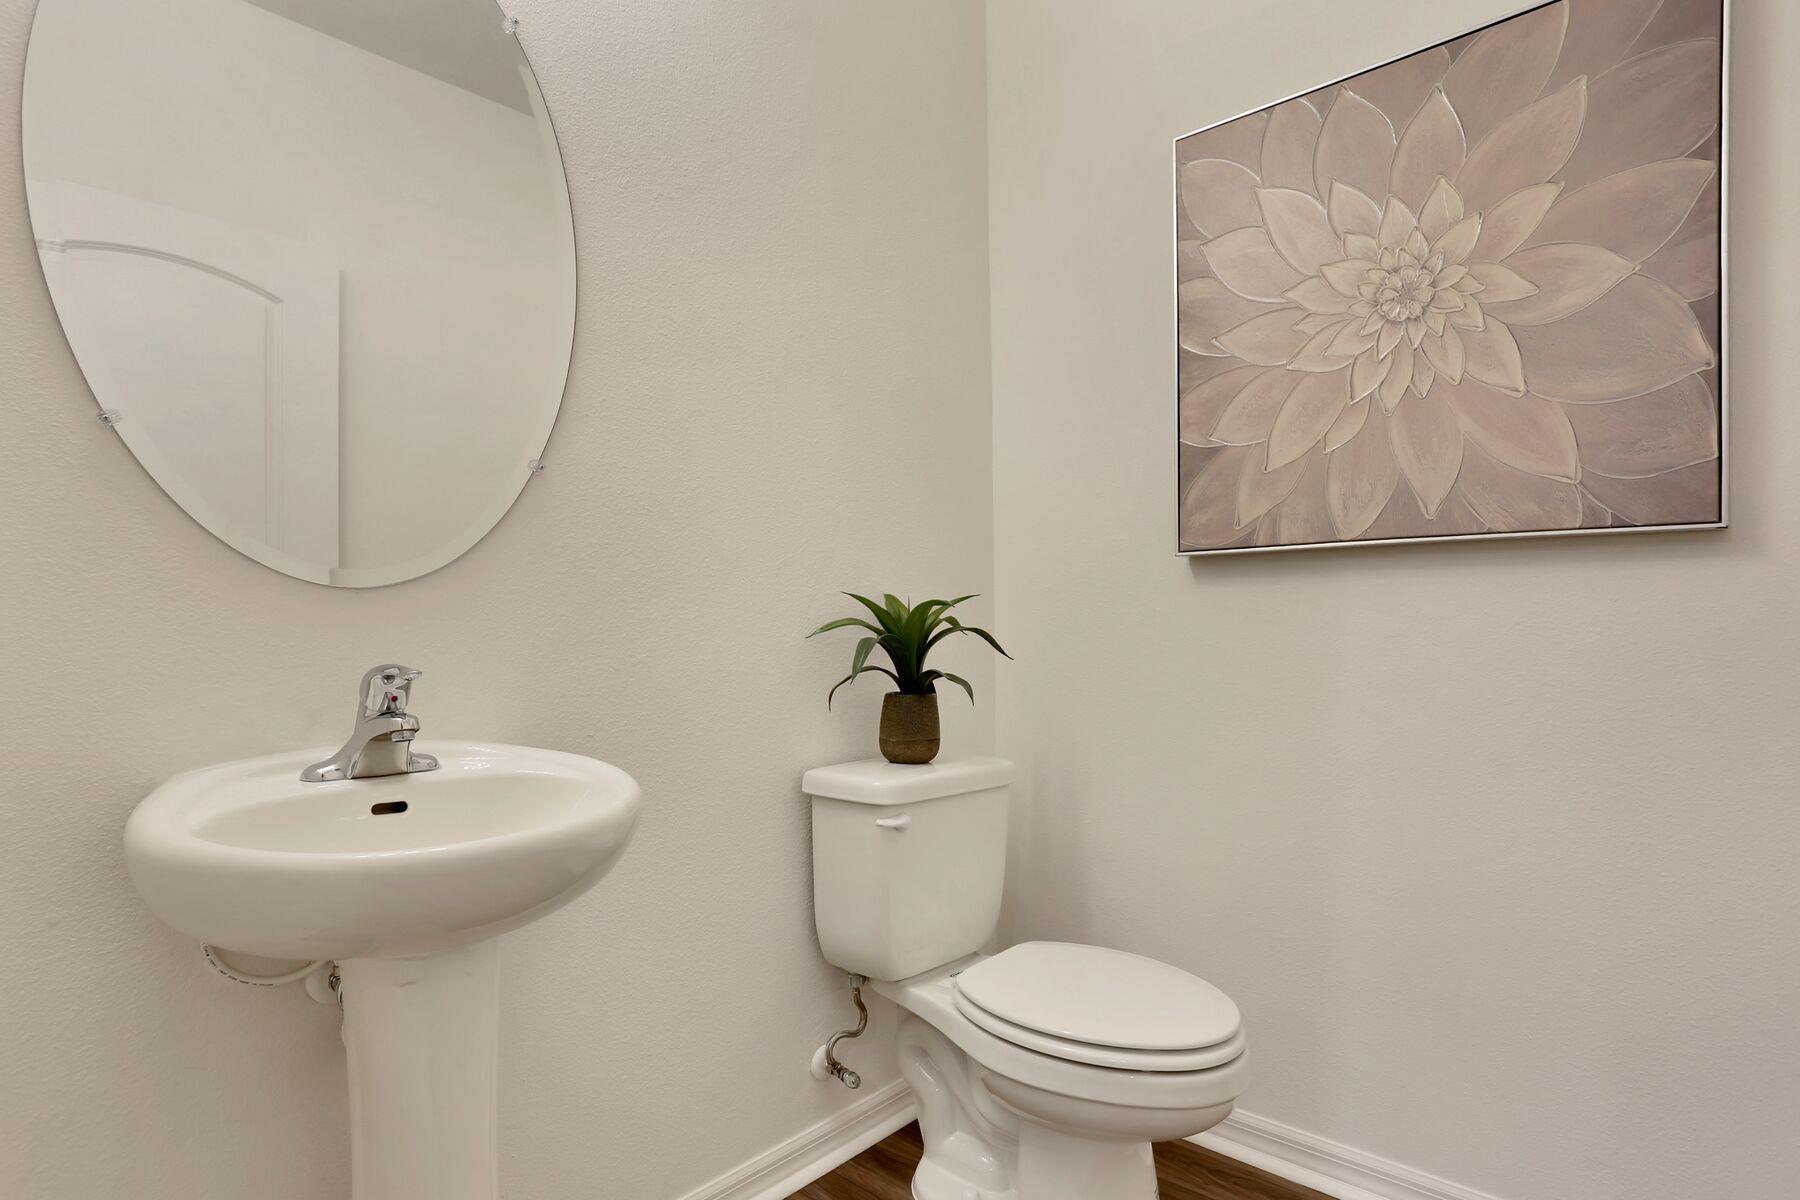 Bathroom featured in the Bimini By LGI Homes in Orlando, FL